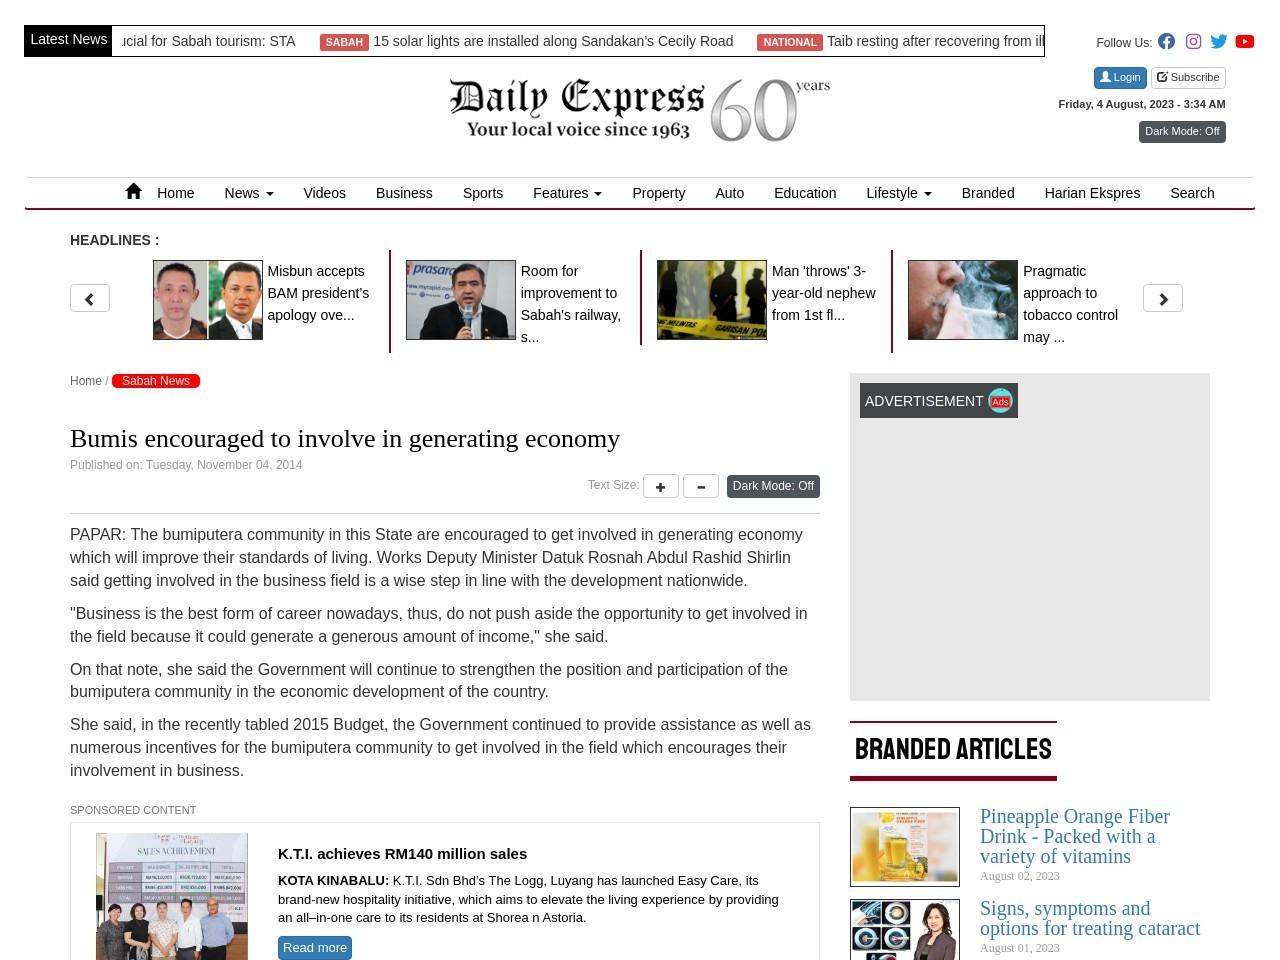 Bumis encouraged to involve in generating economy